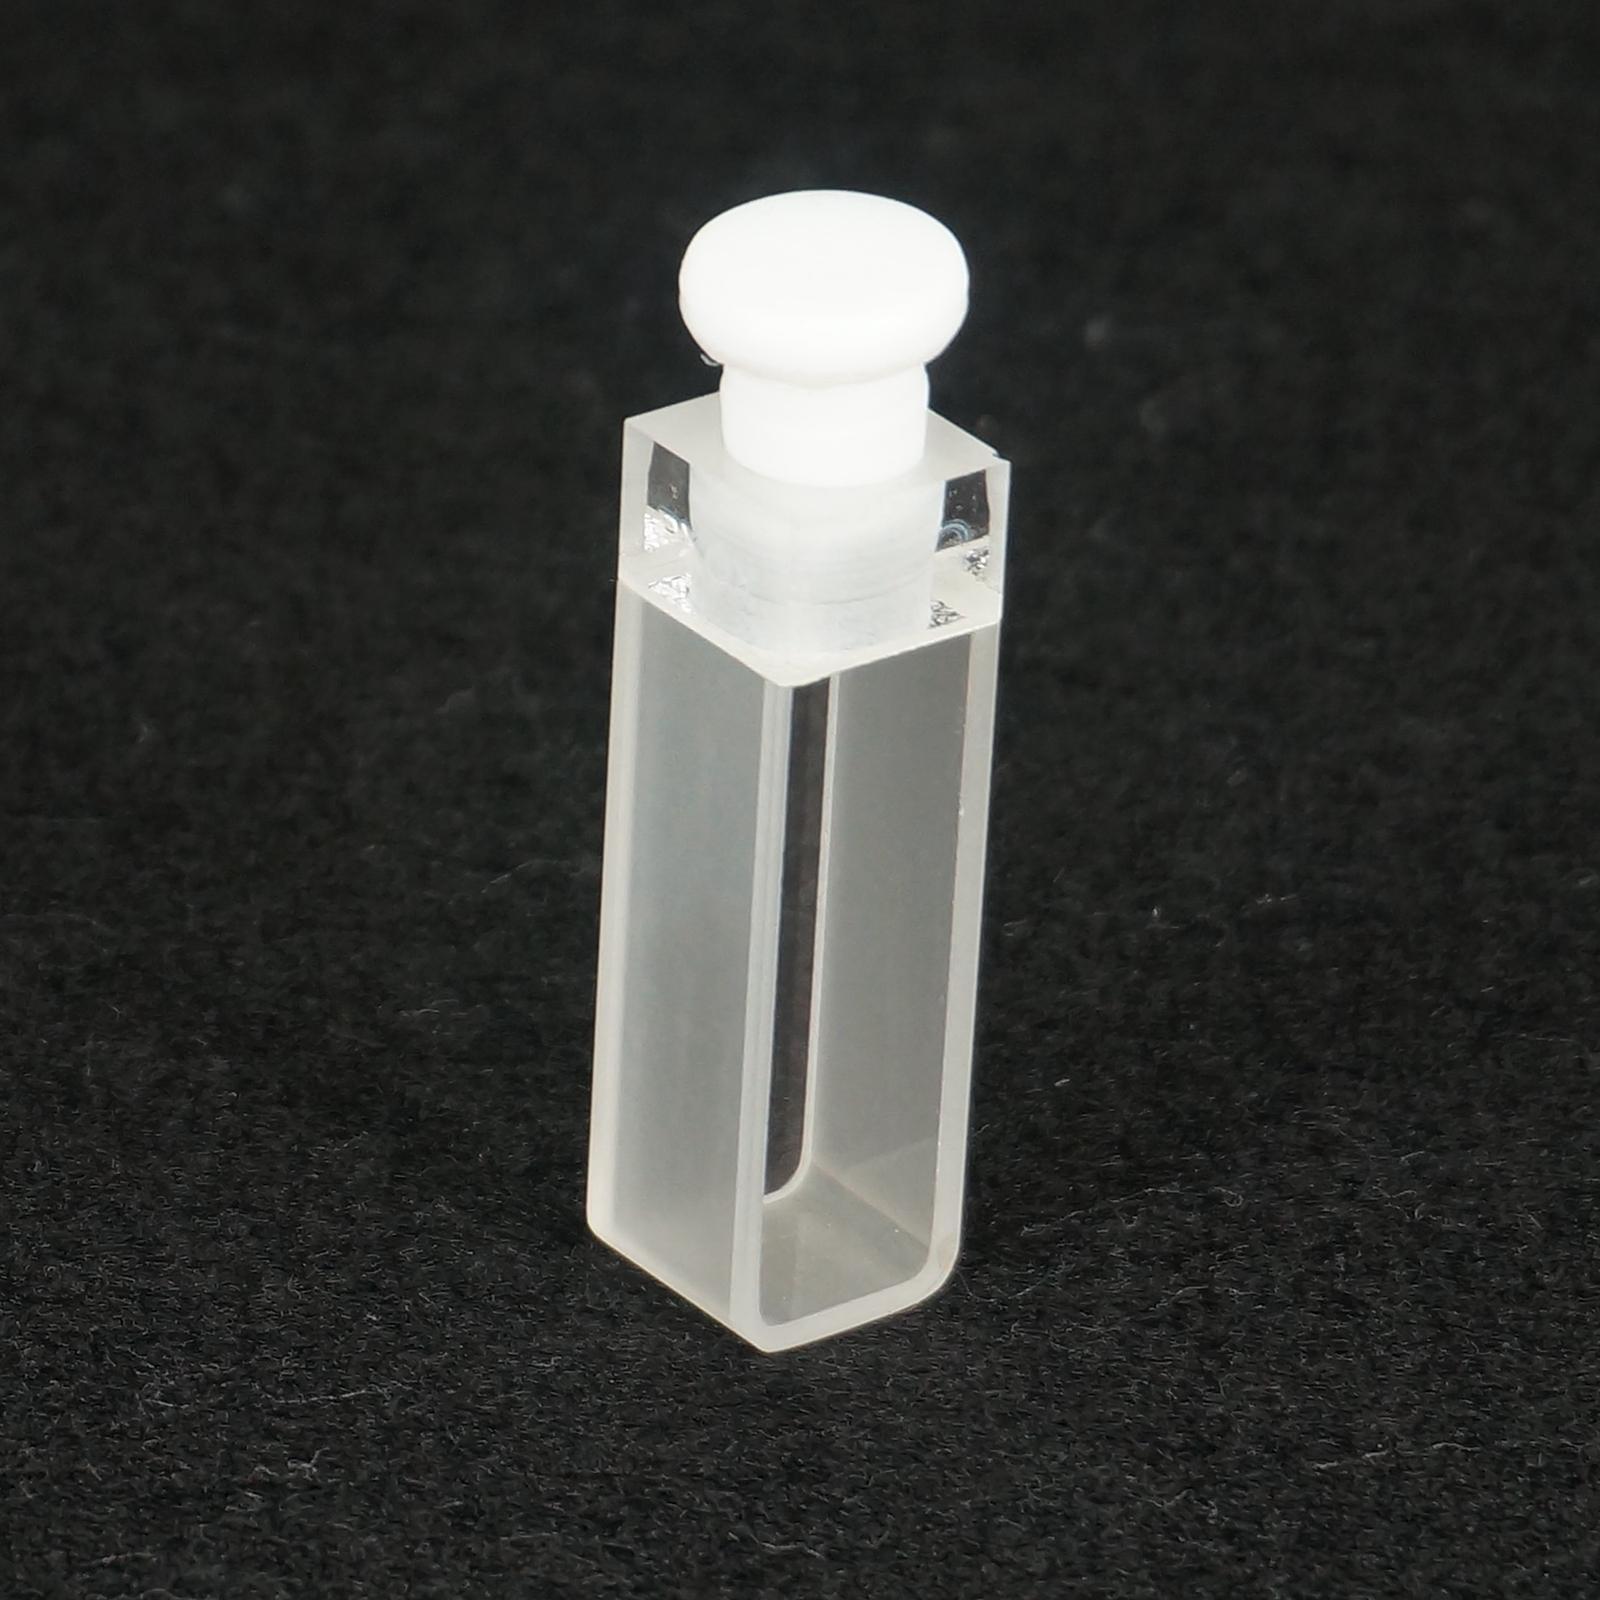 10mm Path Length JGS1 Quartz Fluorescence Cell With Stopper For Uv Spectrometer 1pcs 5mm path length jgs1 quartz cuvette cell with with screw cap for spectrometer 4 widows